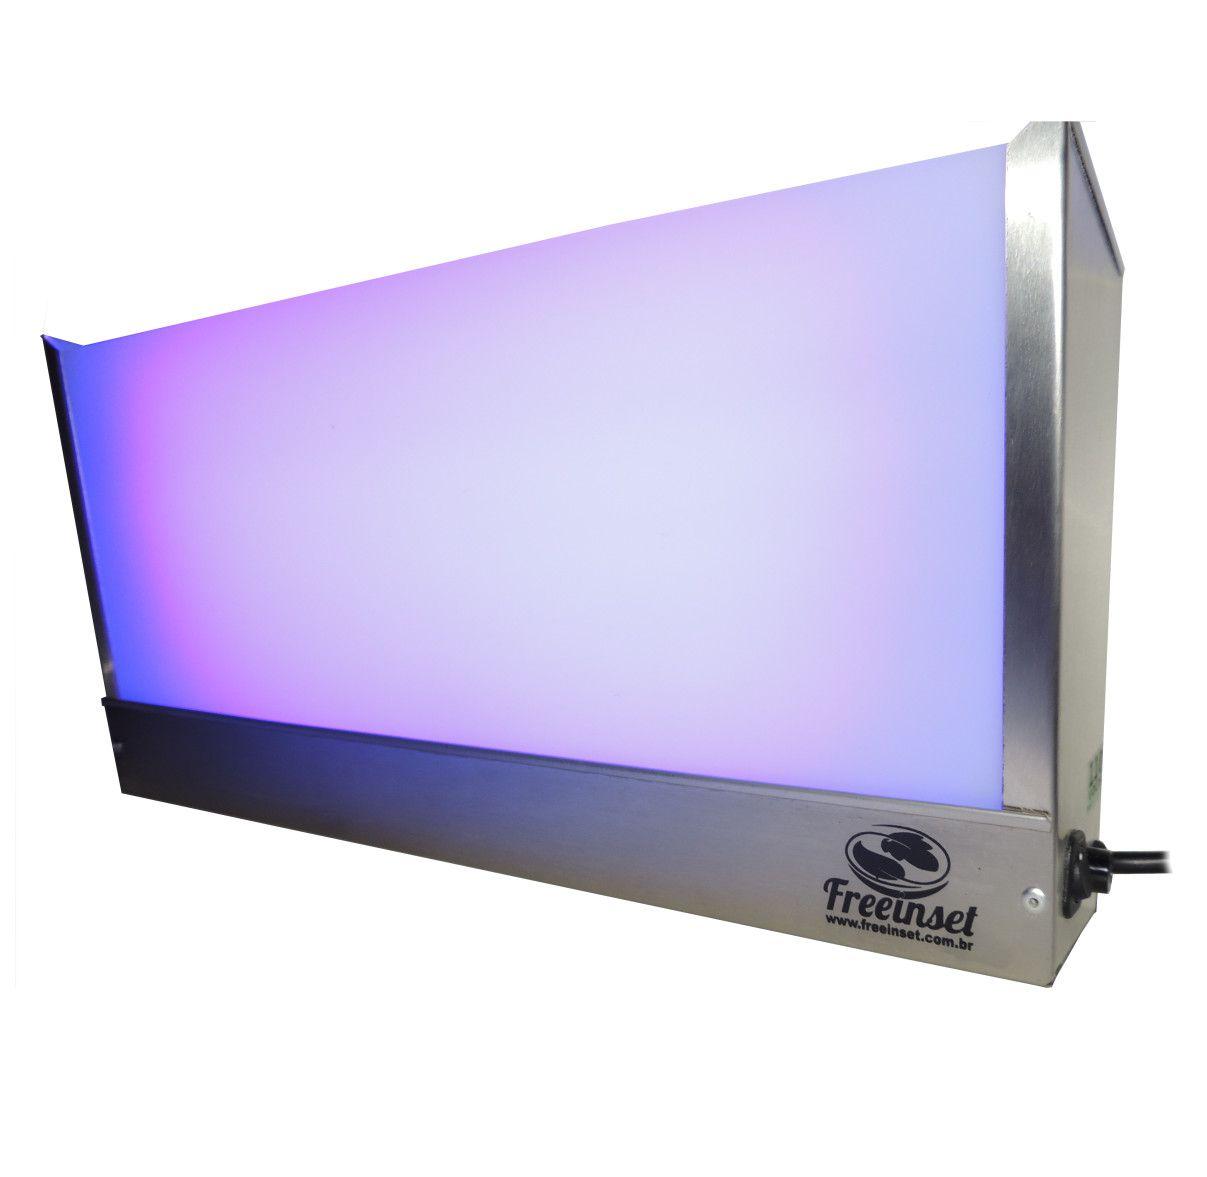 Armadilhas Luminosas TOP, 15w, até 25m², Bivolt, Aço Inox Escovado